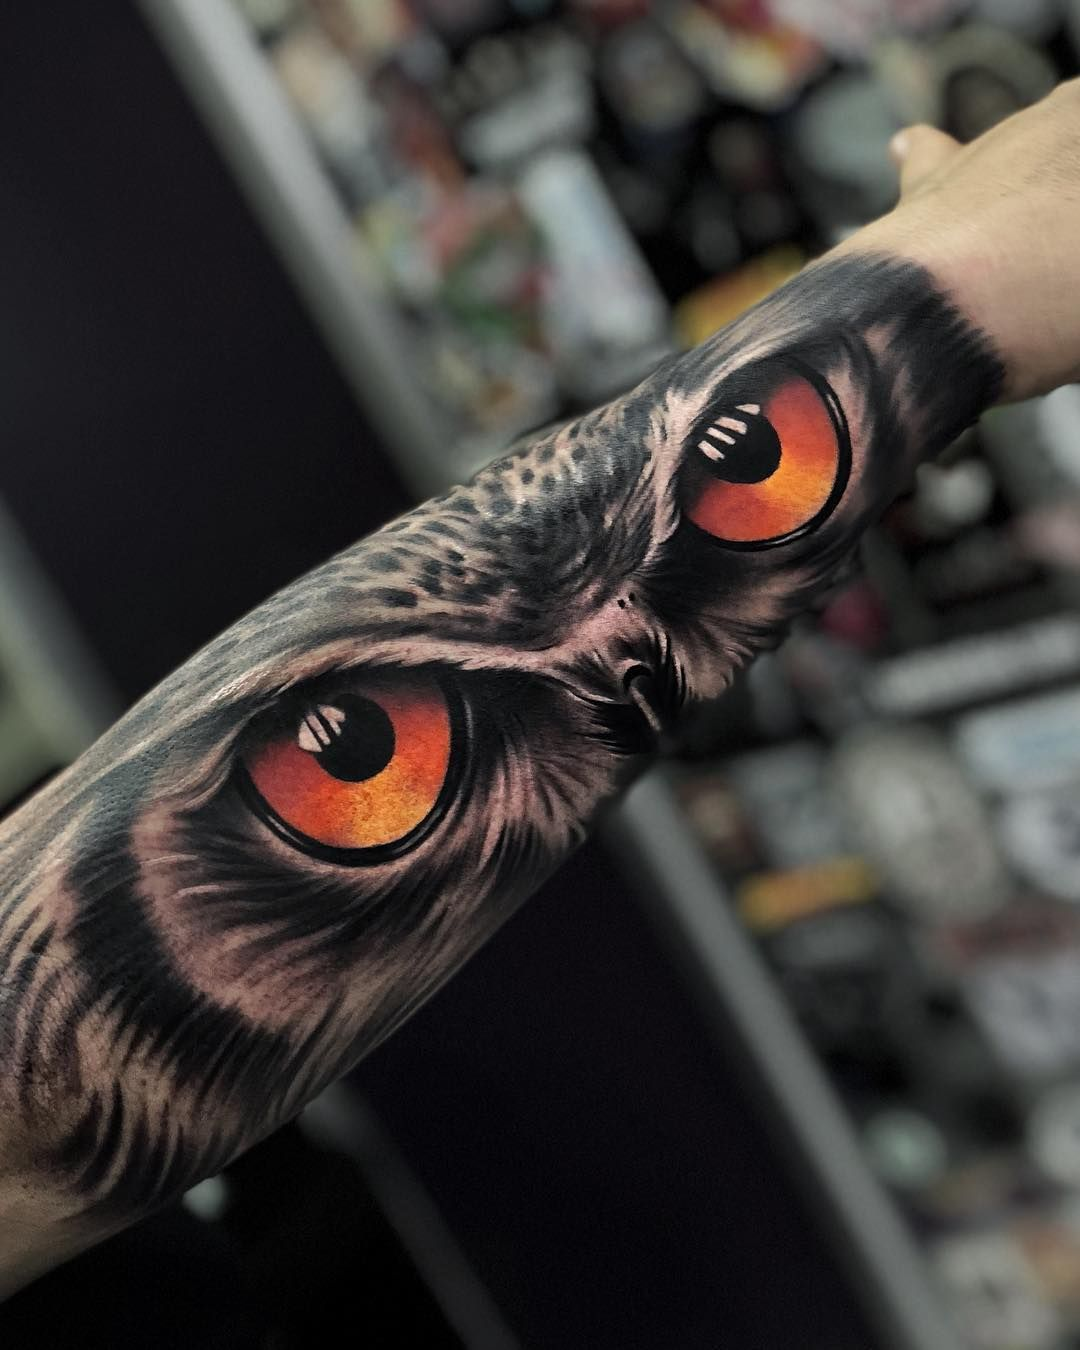 Creative Owl Tattoo C Tattoo Studio Real Ink Tattoo Studio Olhos De Tigre Tatuagem Tatuagem De Tigre Branco Tatuagem Coruja